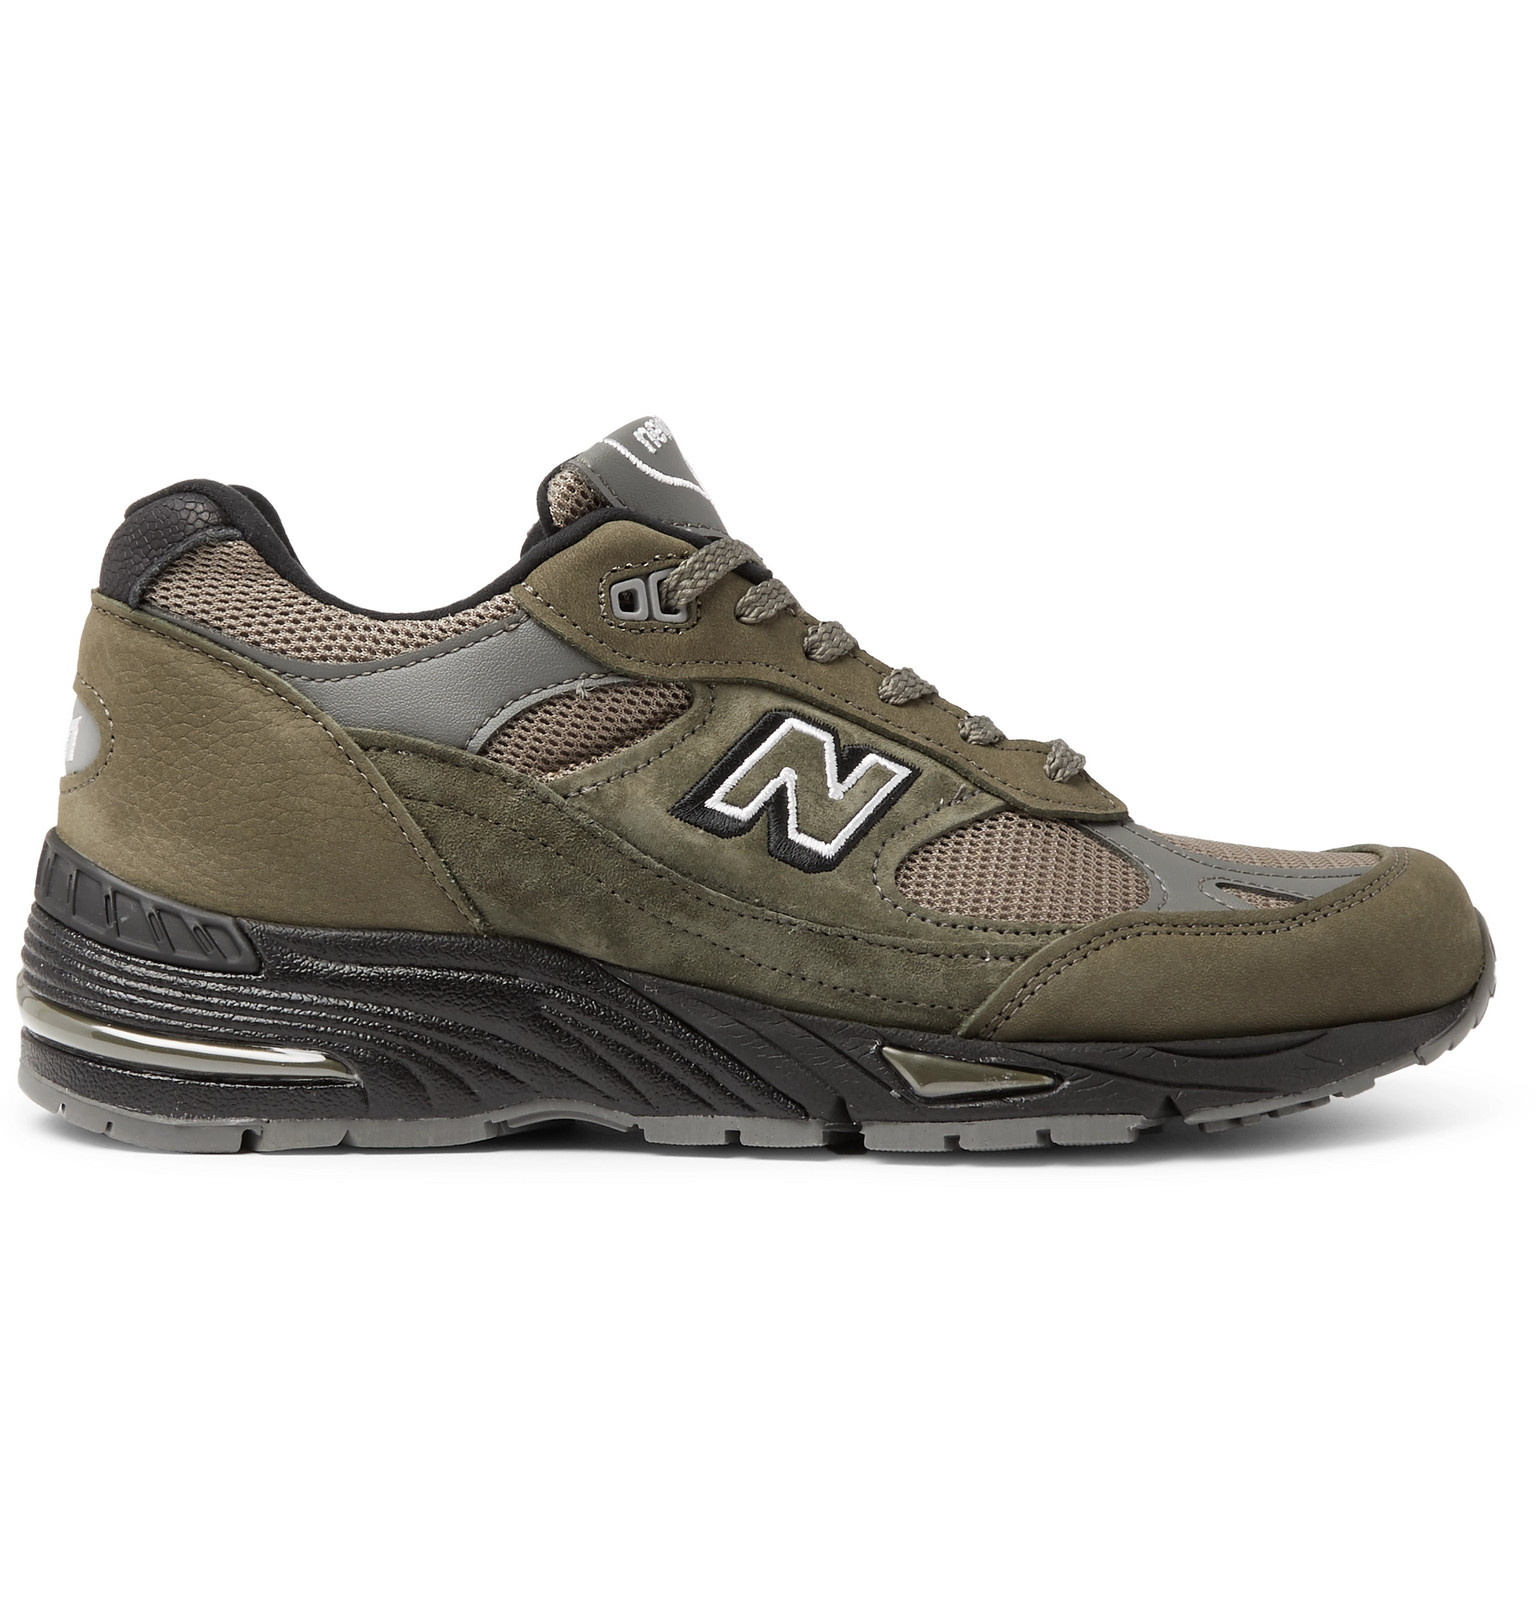 new balance 991 boots